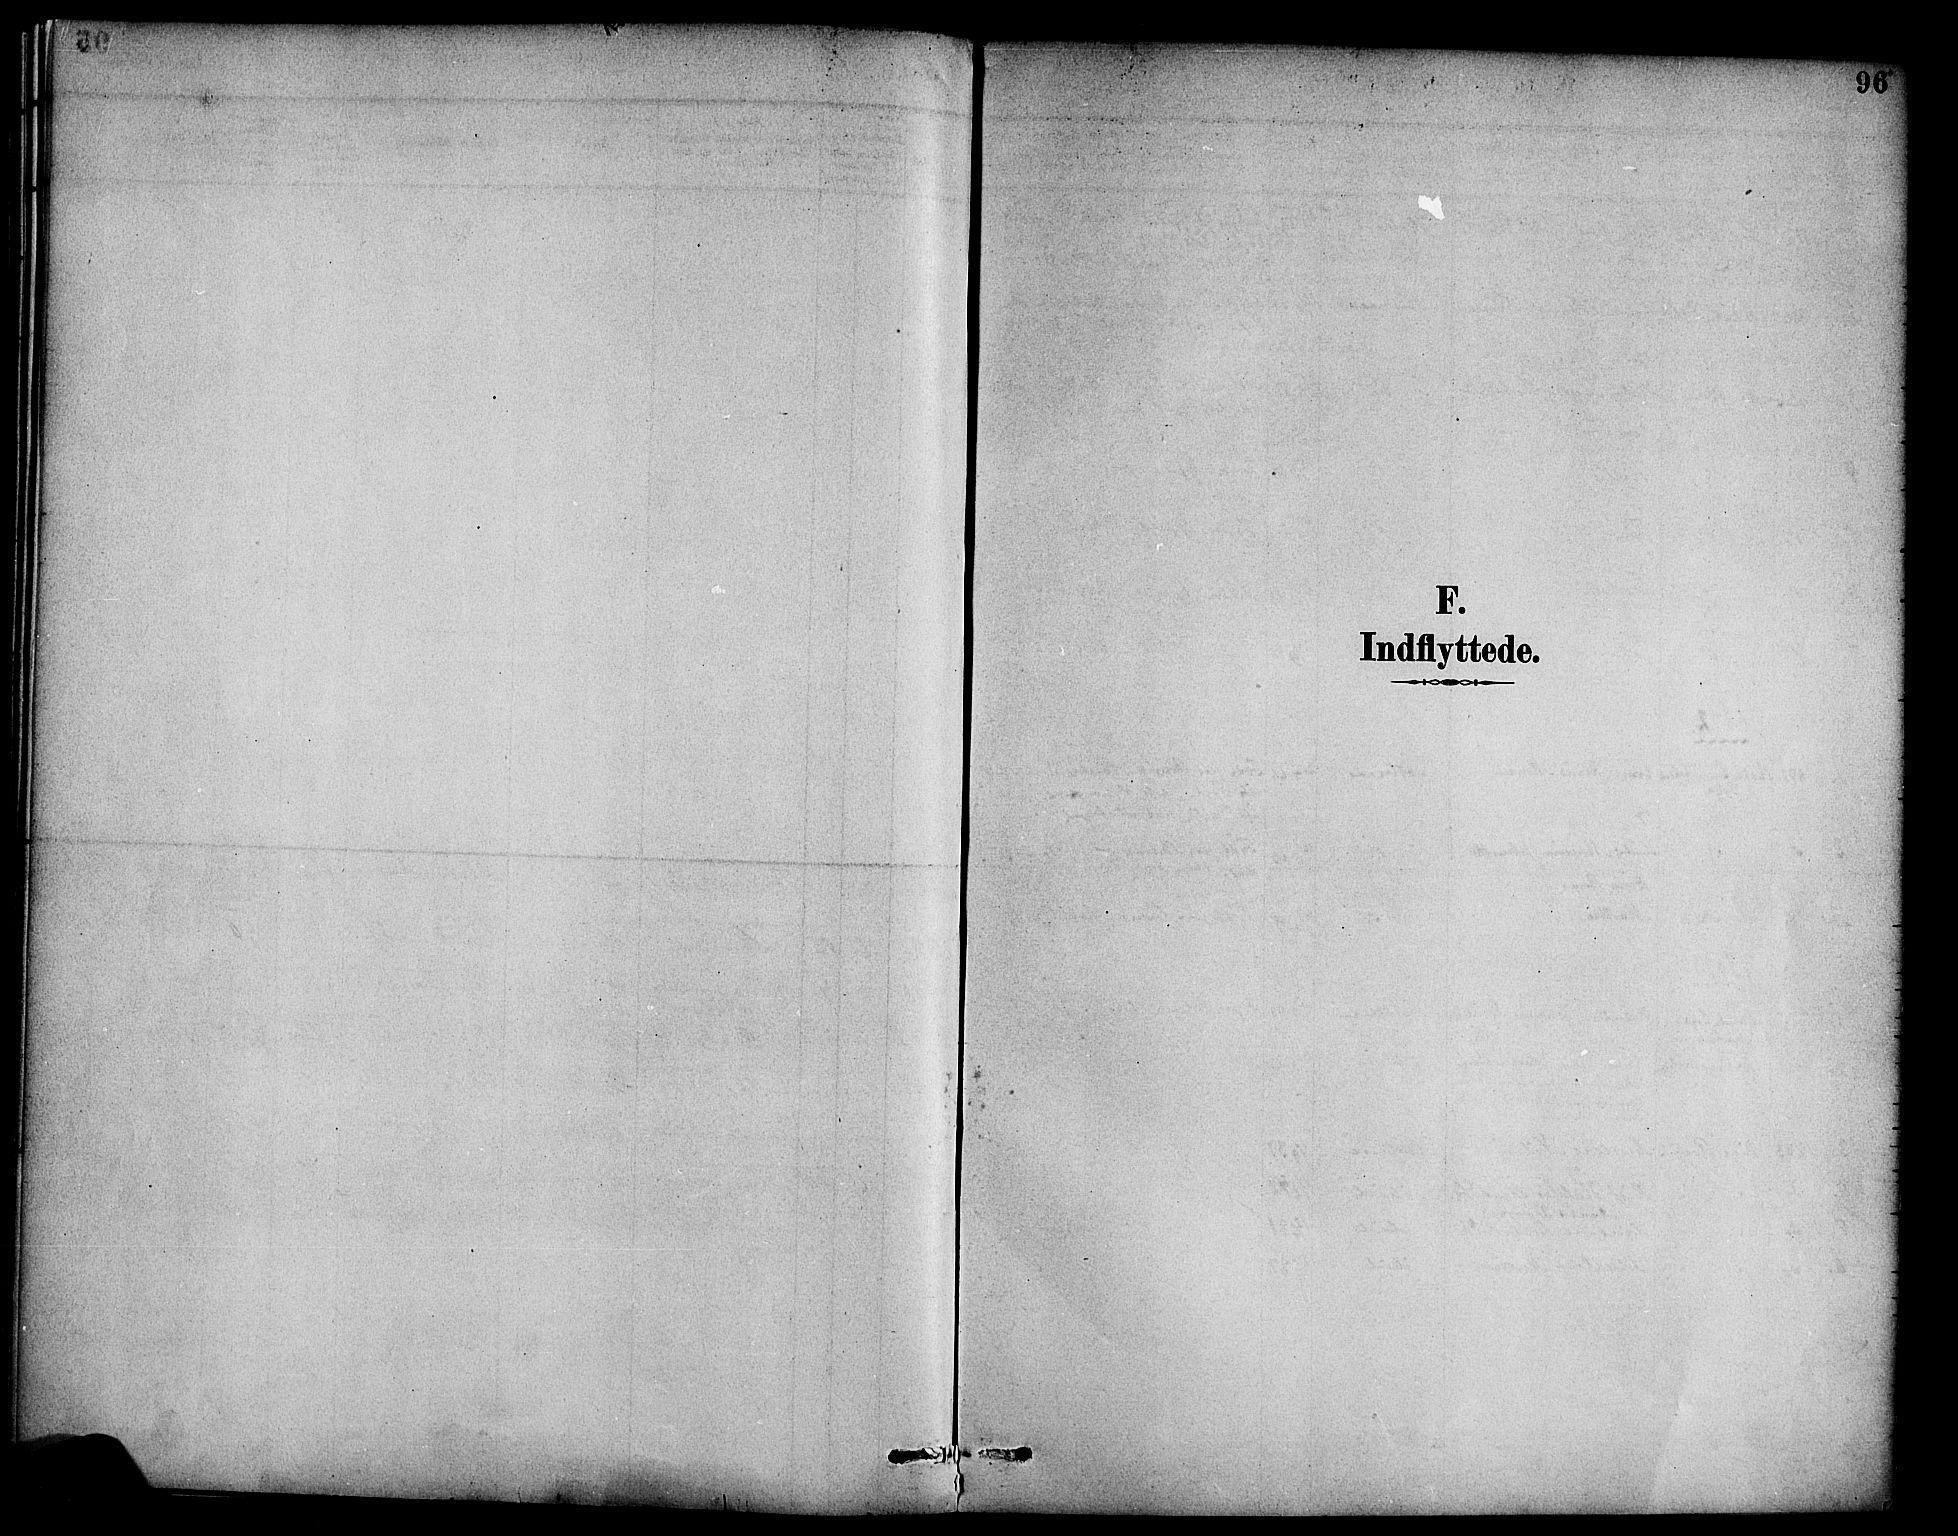 SAB, Hyllestad sokneprestembete, Ministerialbok nr. B 1, 1886-1904, s. 96